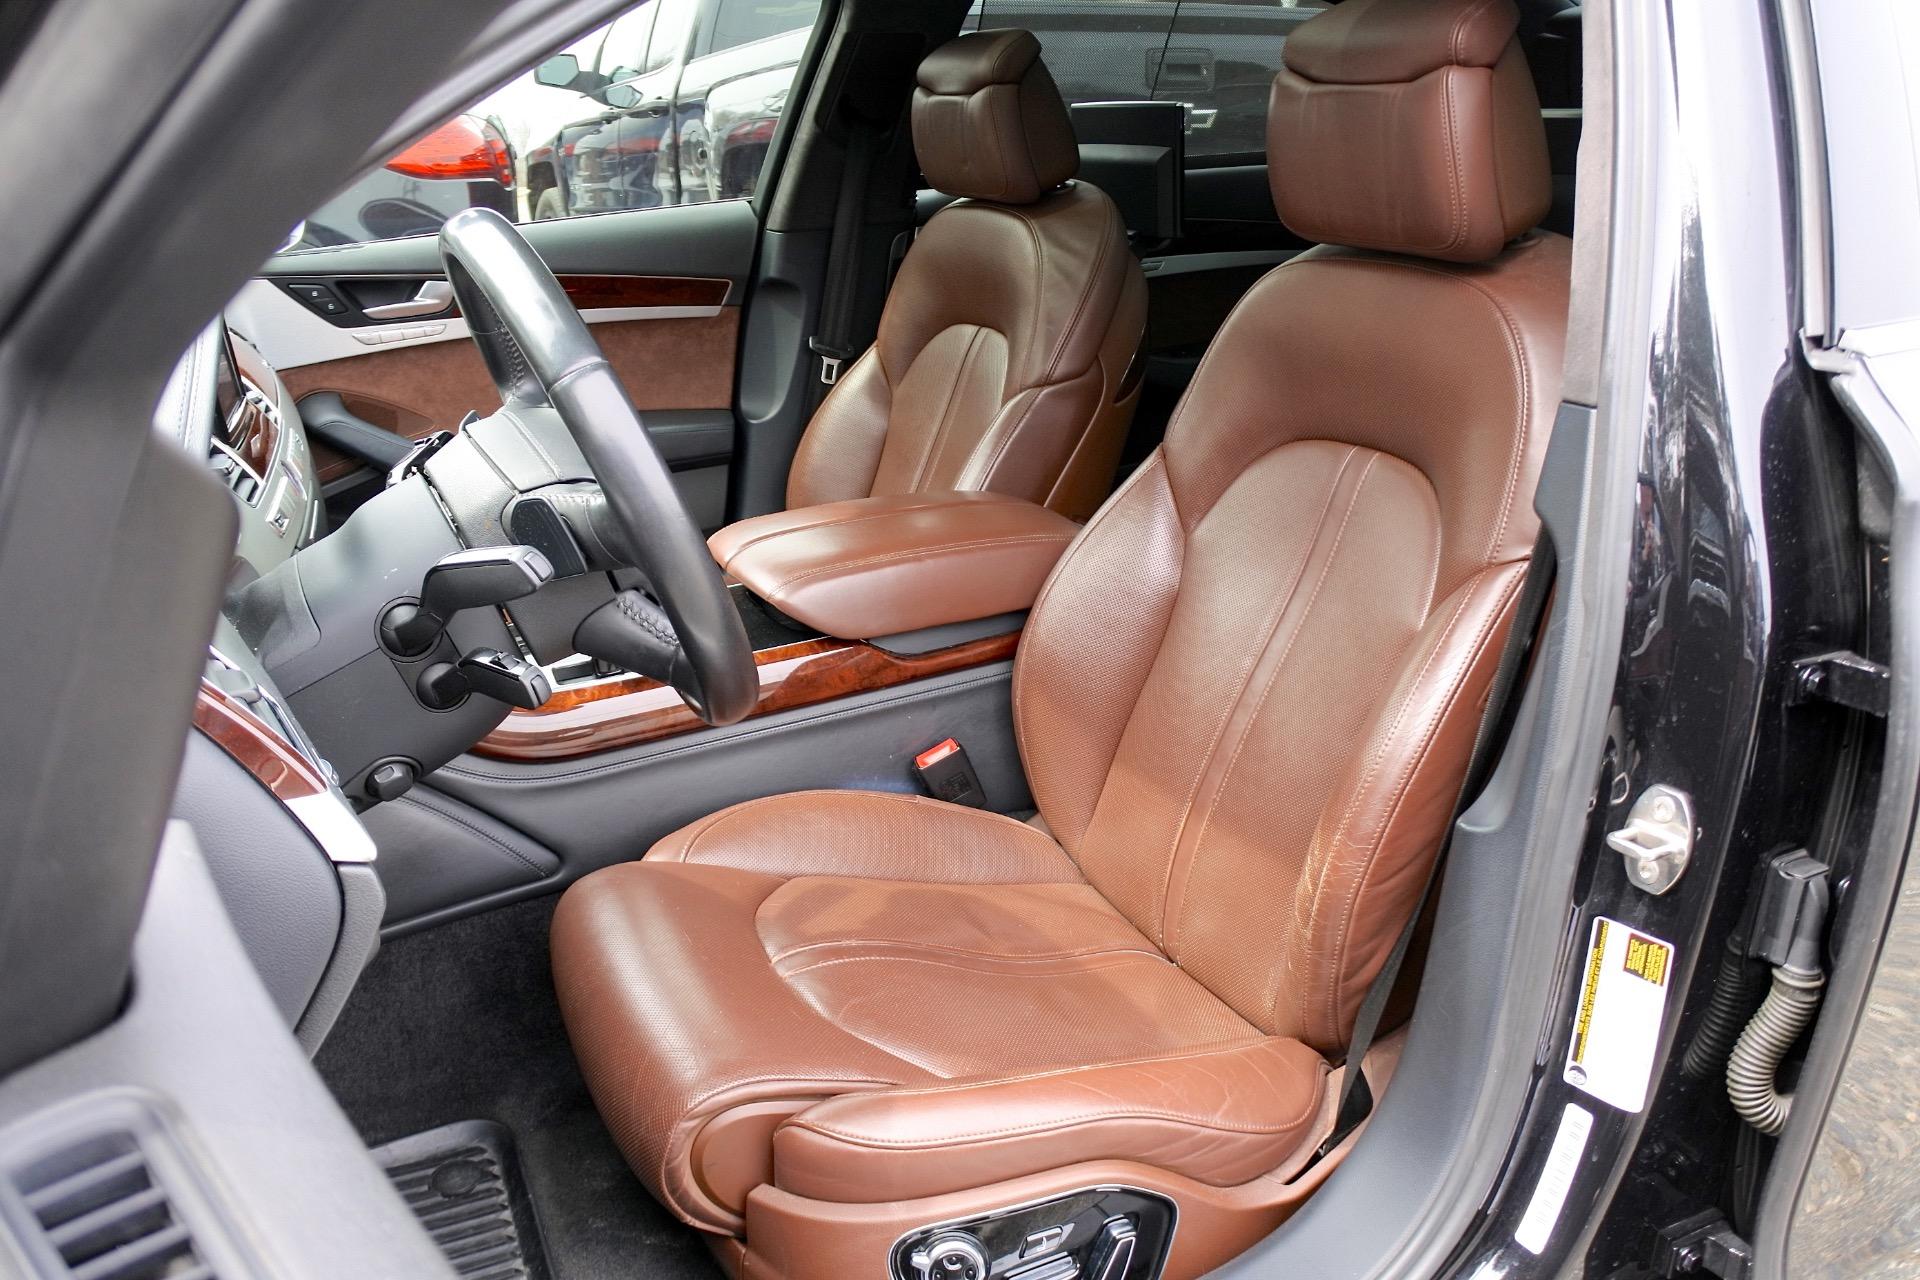 Used 2012 Audi A8 l W12 Quattro Used 2012 Audi A8 l W12 Quattro for sale  at Metro West Motorcars LLC in Shrewsbury MA 15